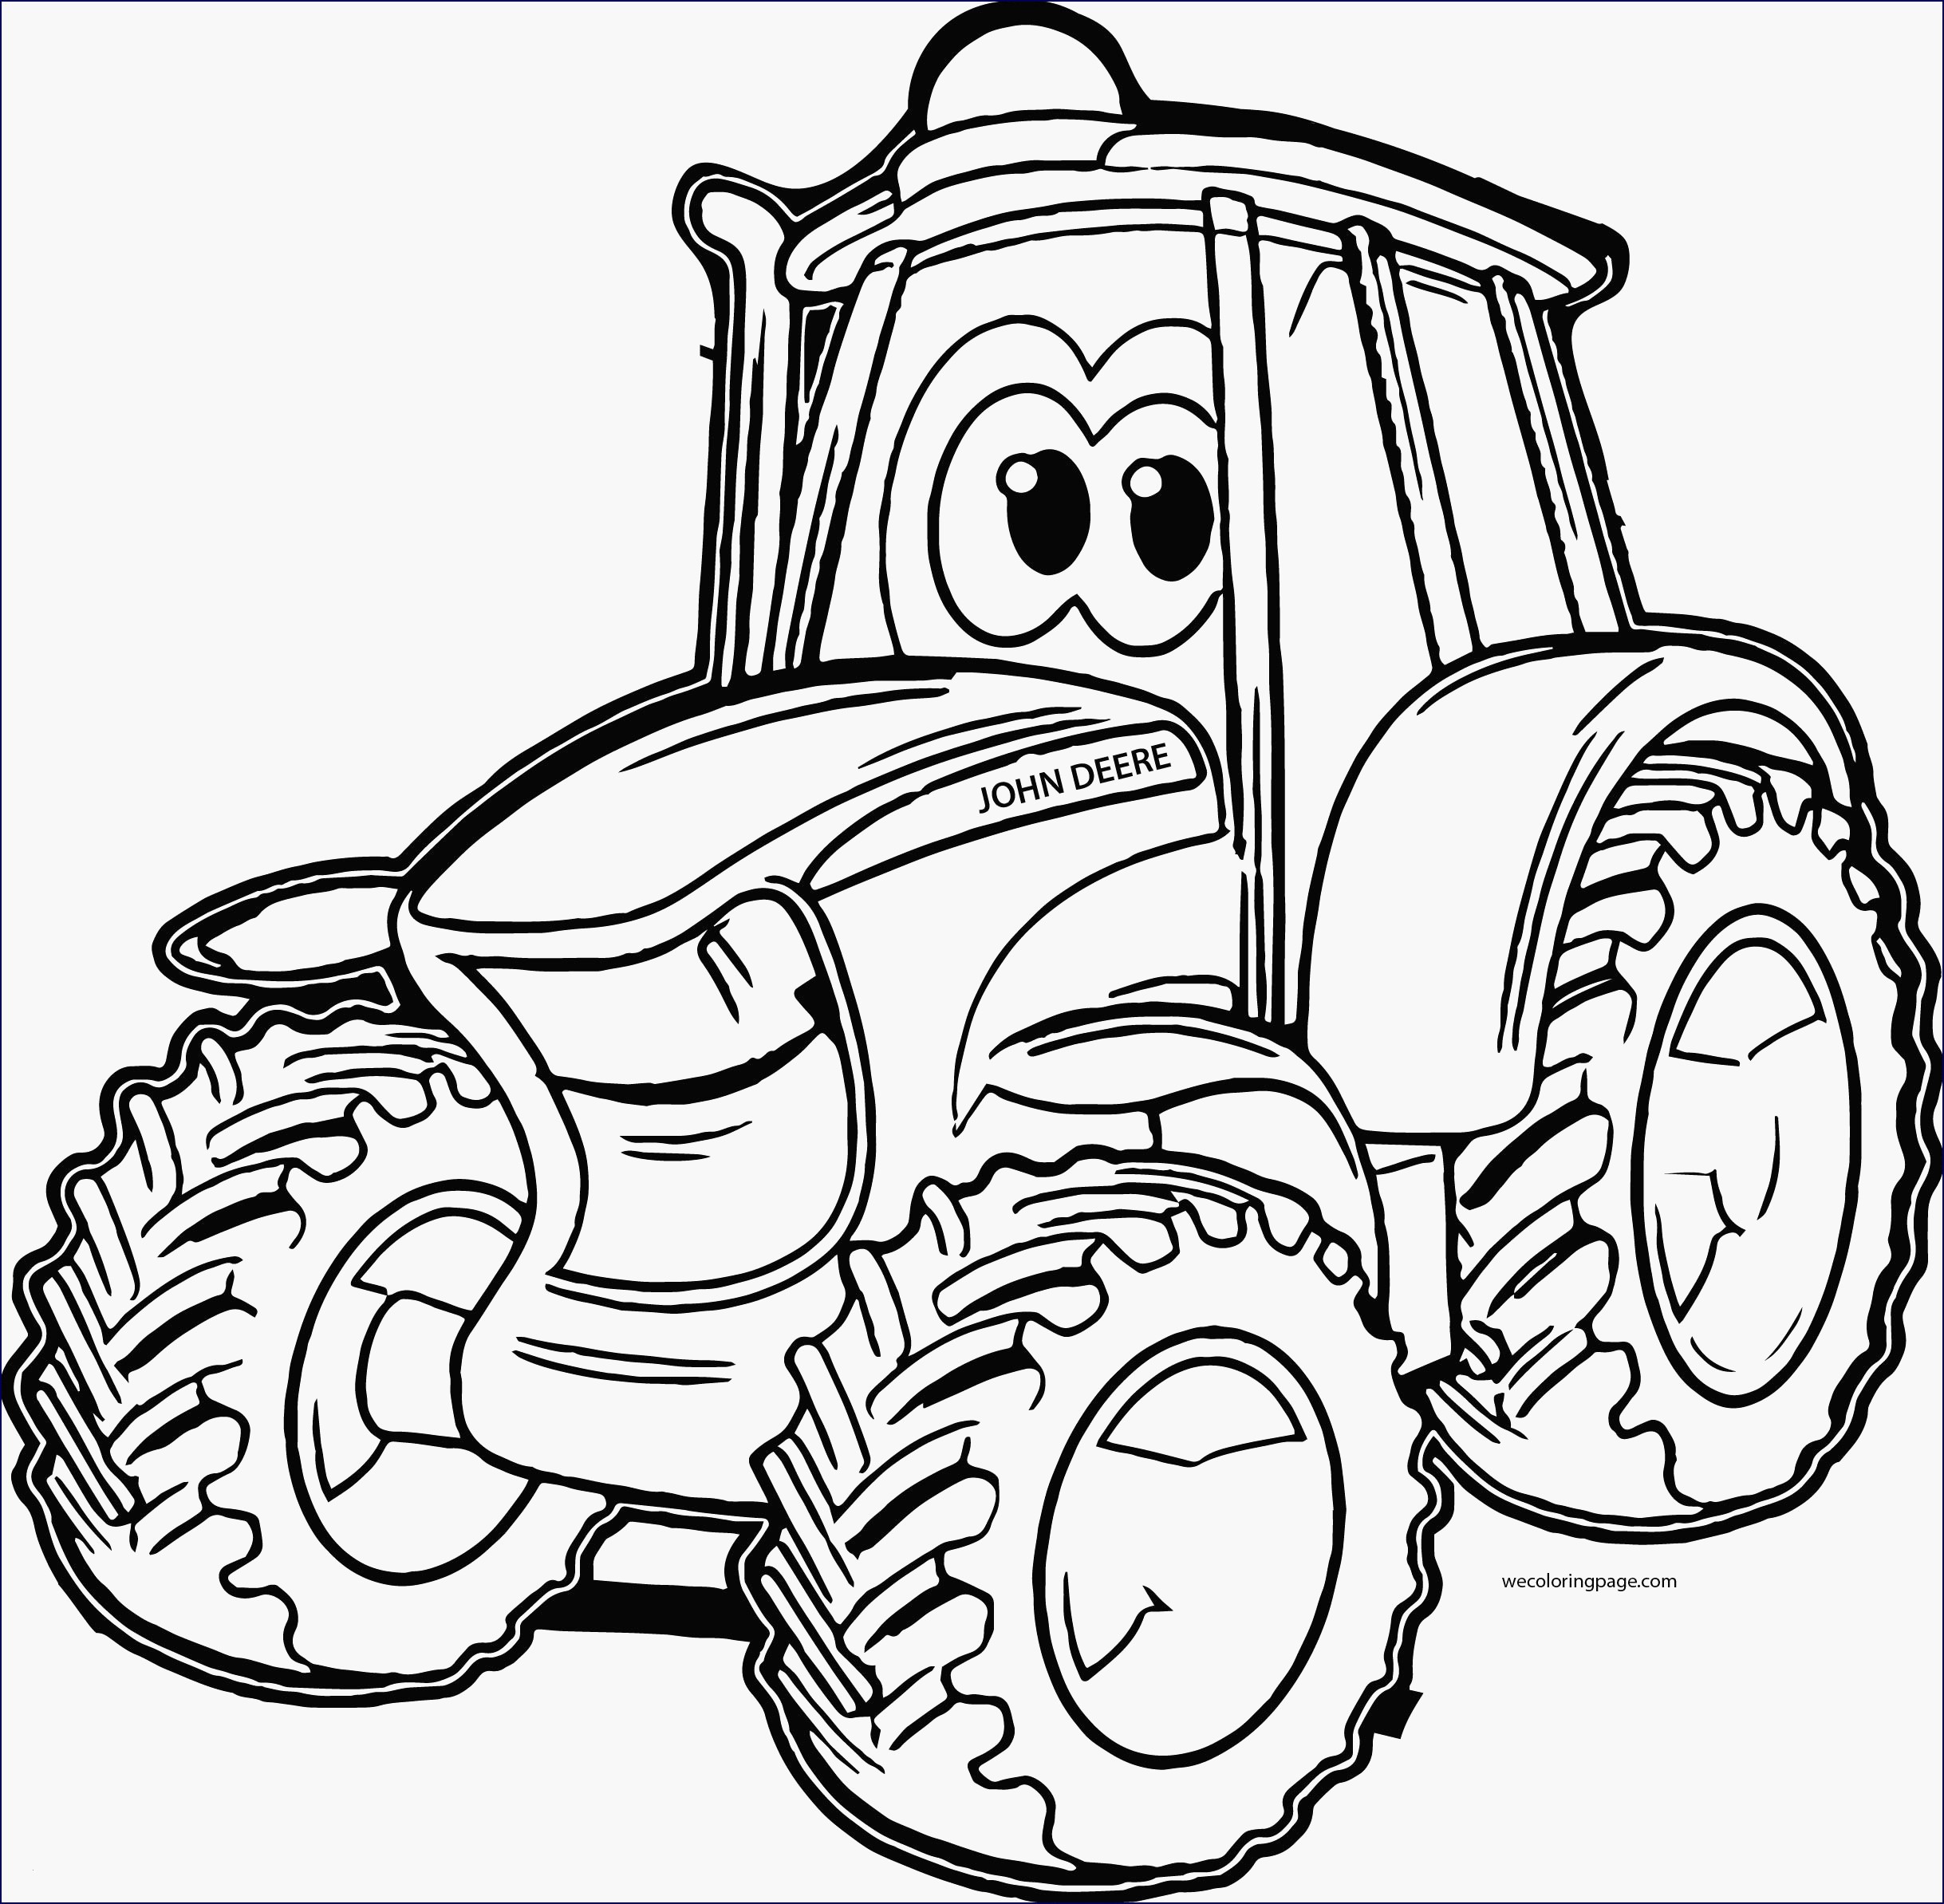 99 Genial Traktor Ausmalbilder John Deere Fotos Kinder Bilder